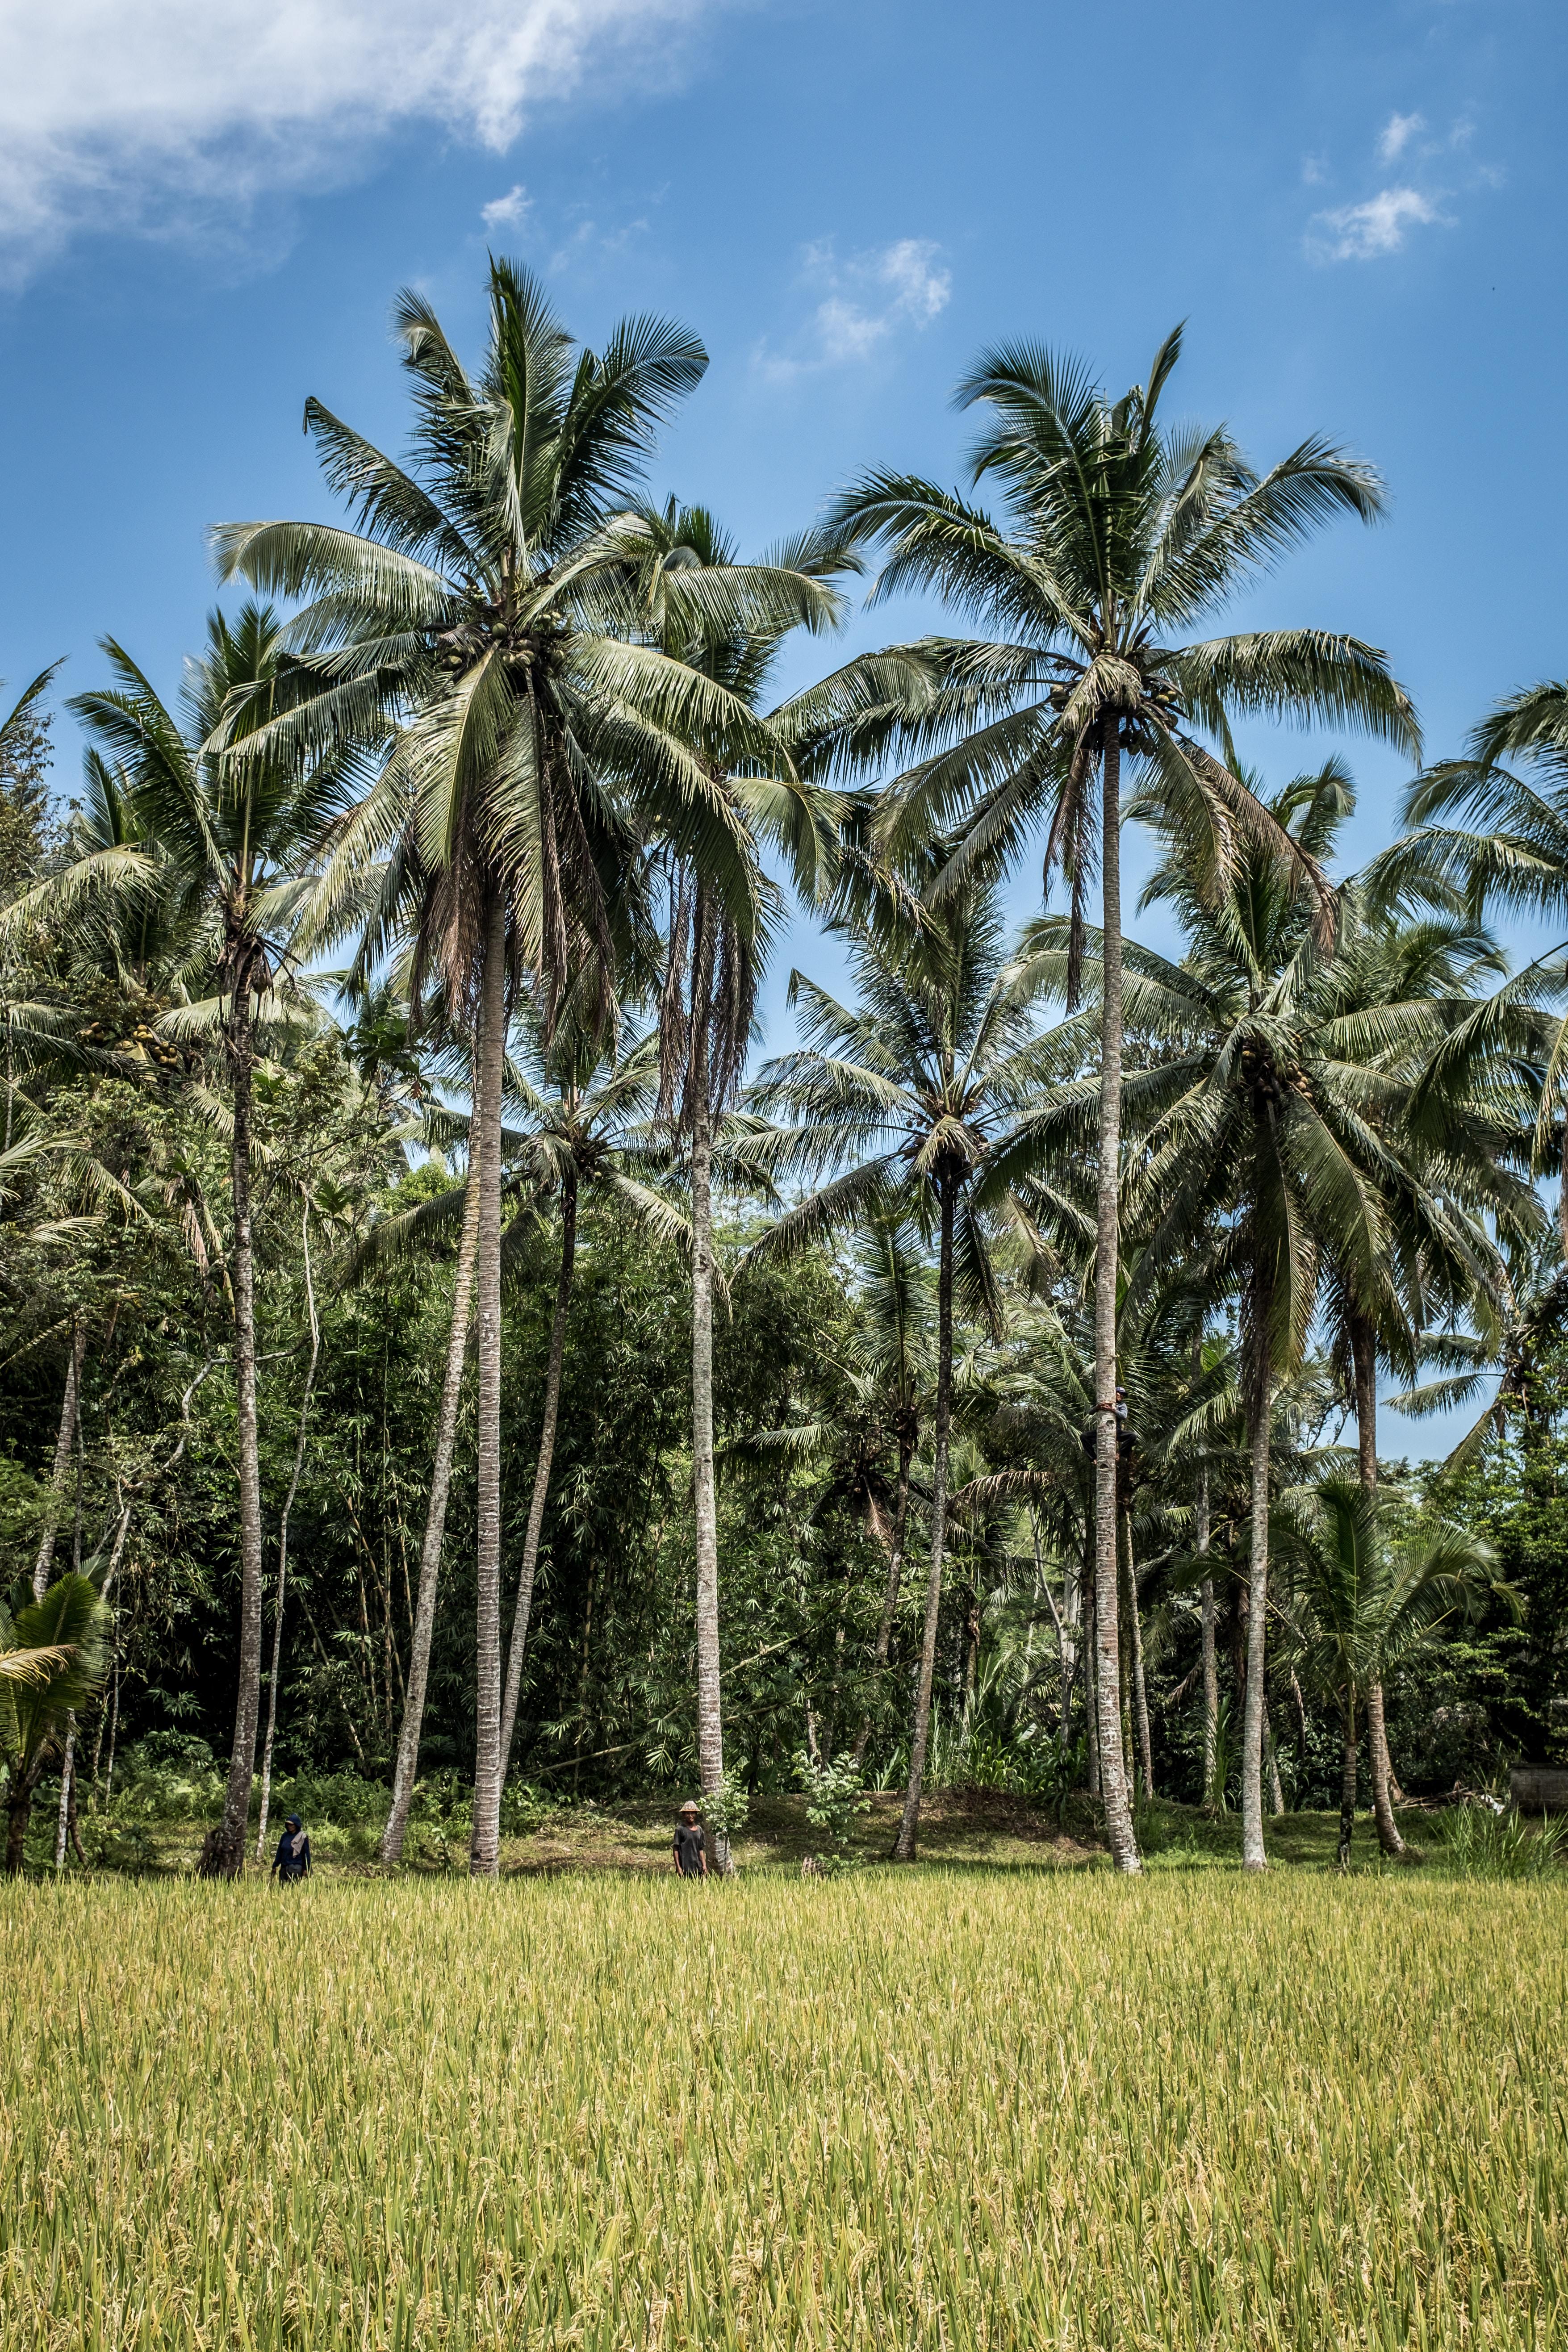 coconut trees on green grass field